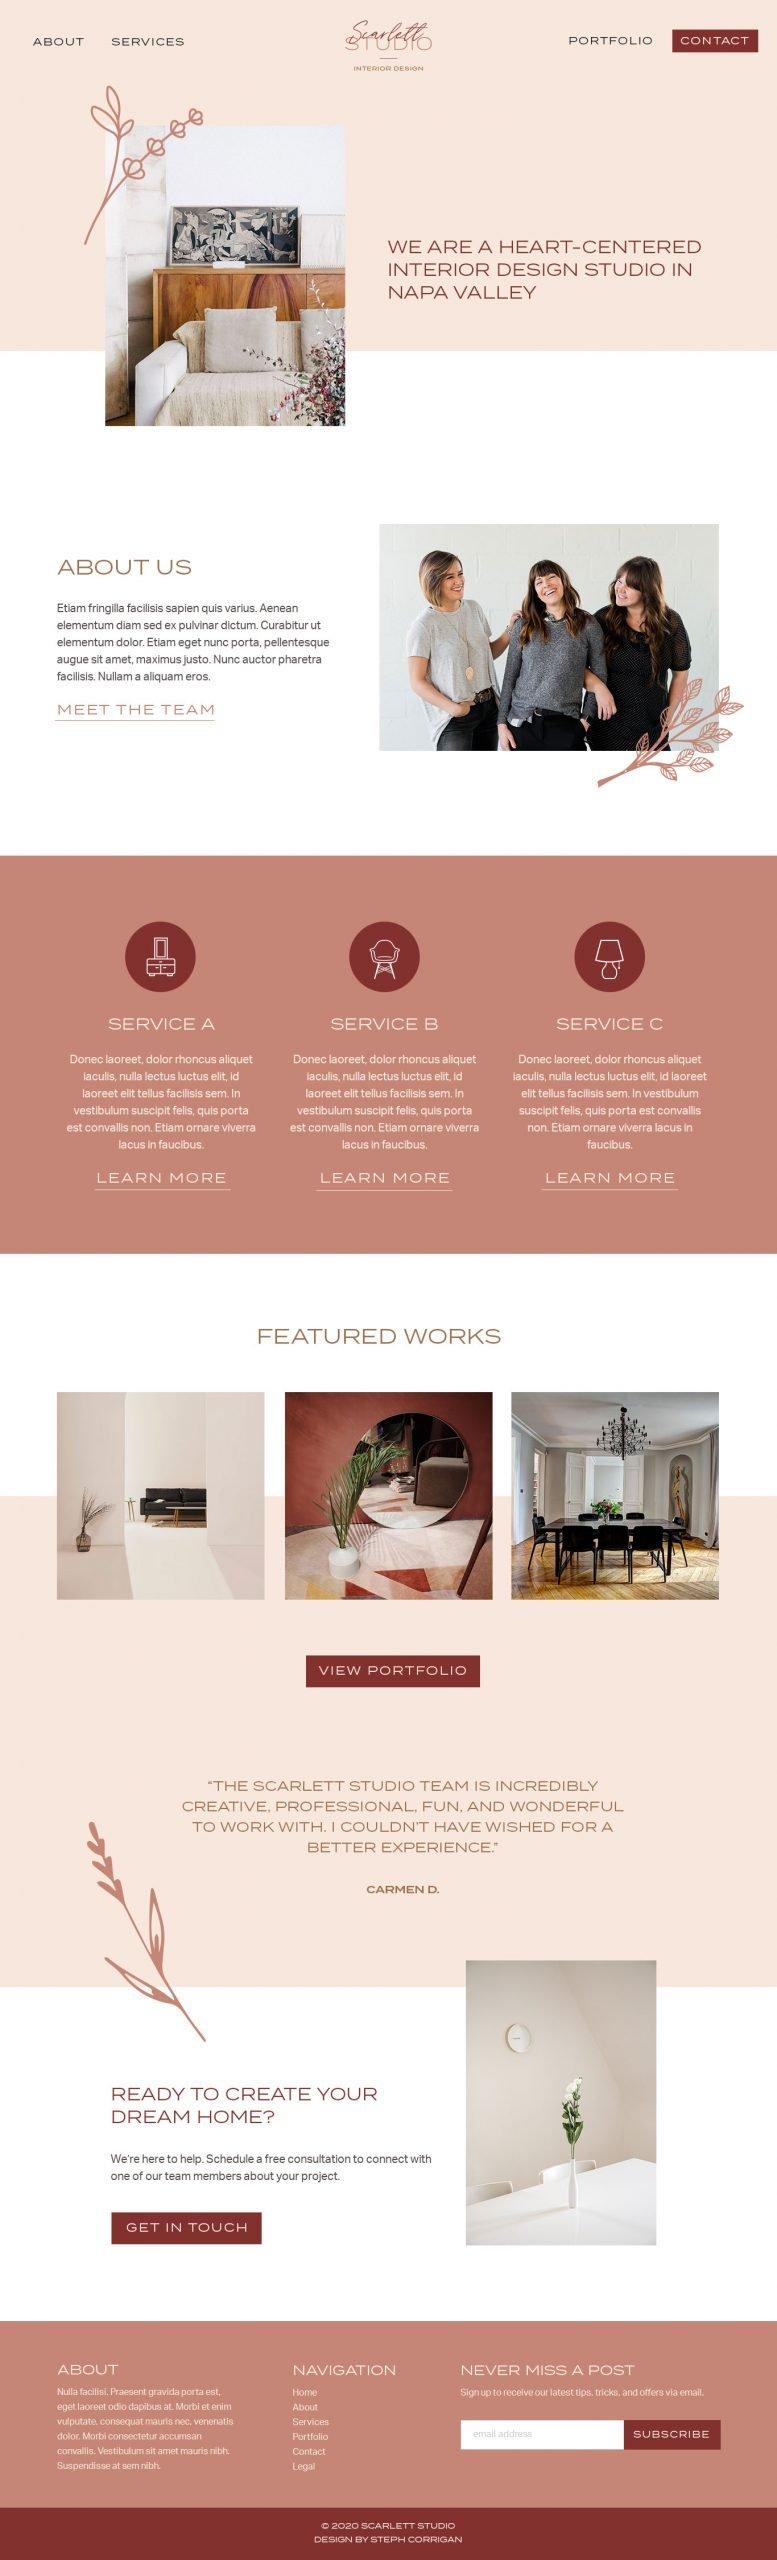 Custom homepage web design for Scarlett Studio Interior Design